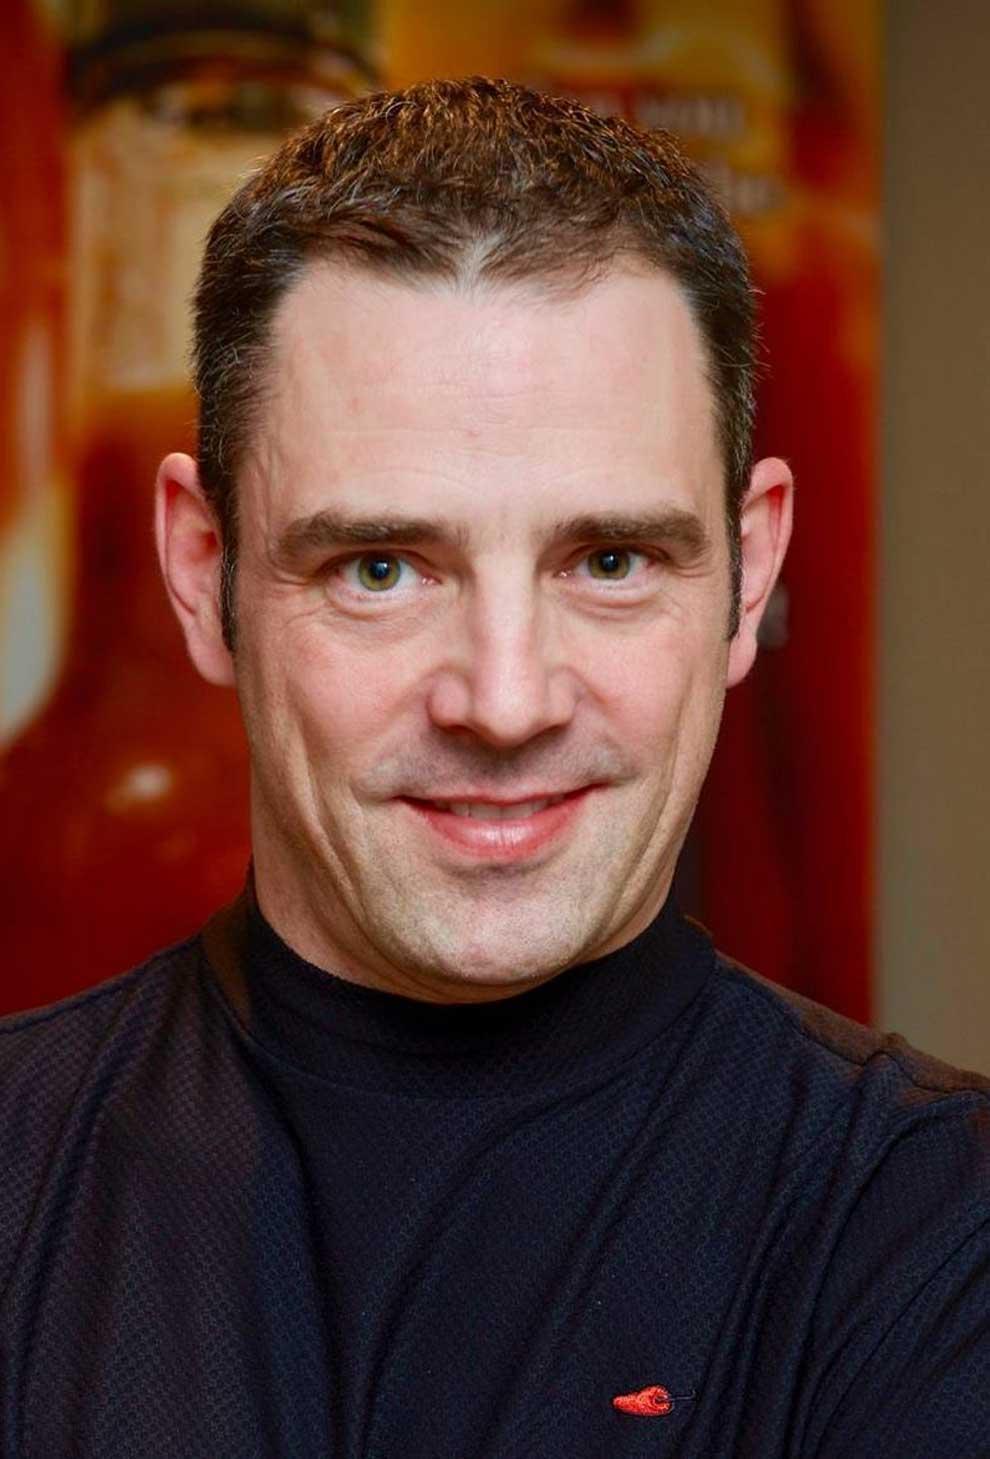 Pierre Bourgon